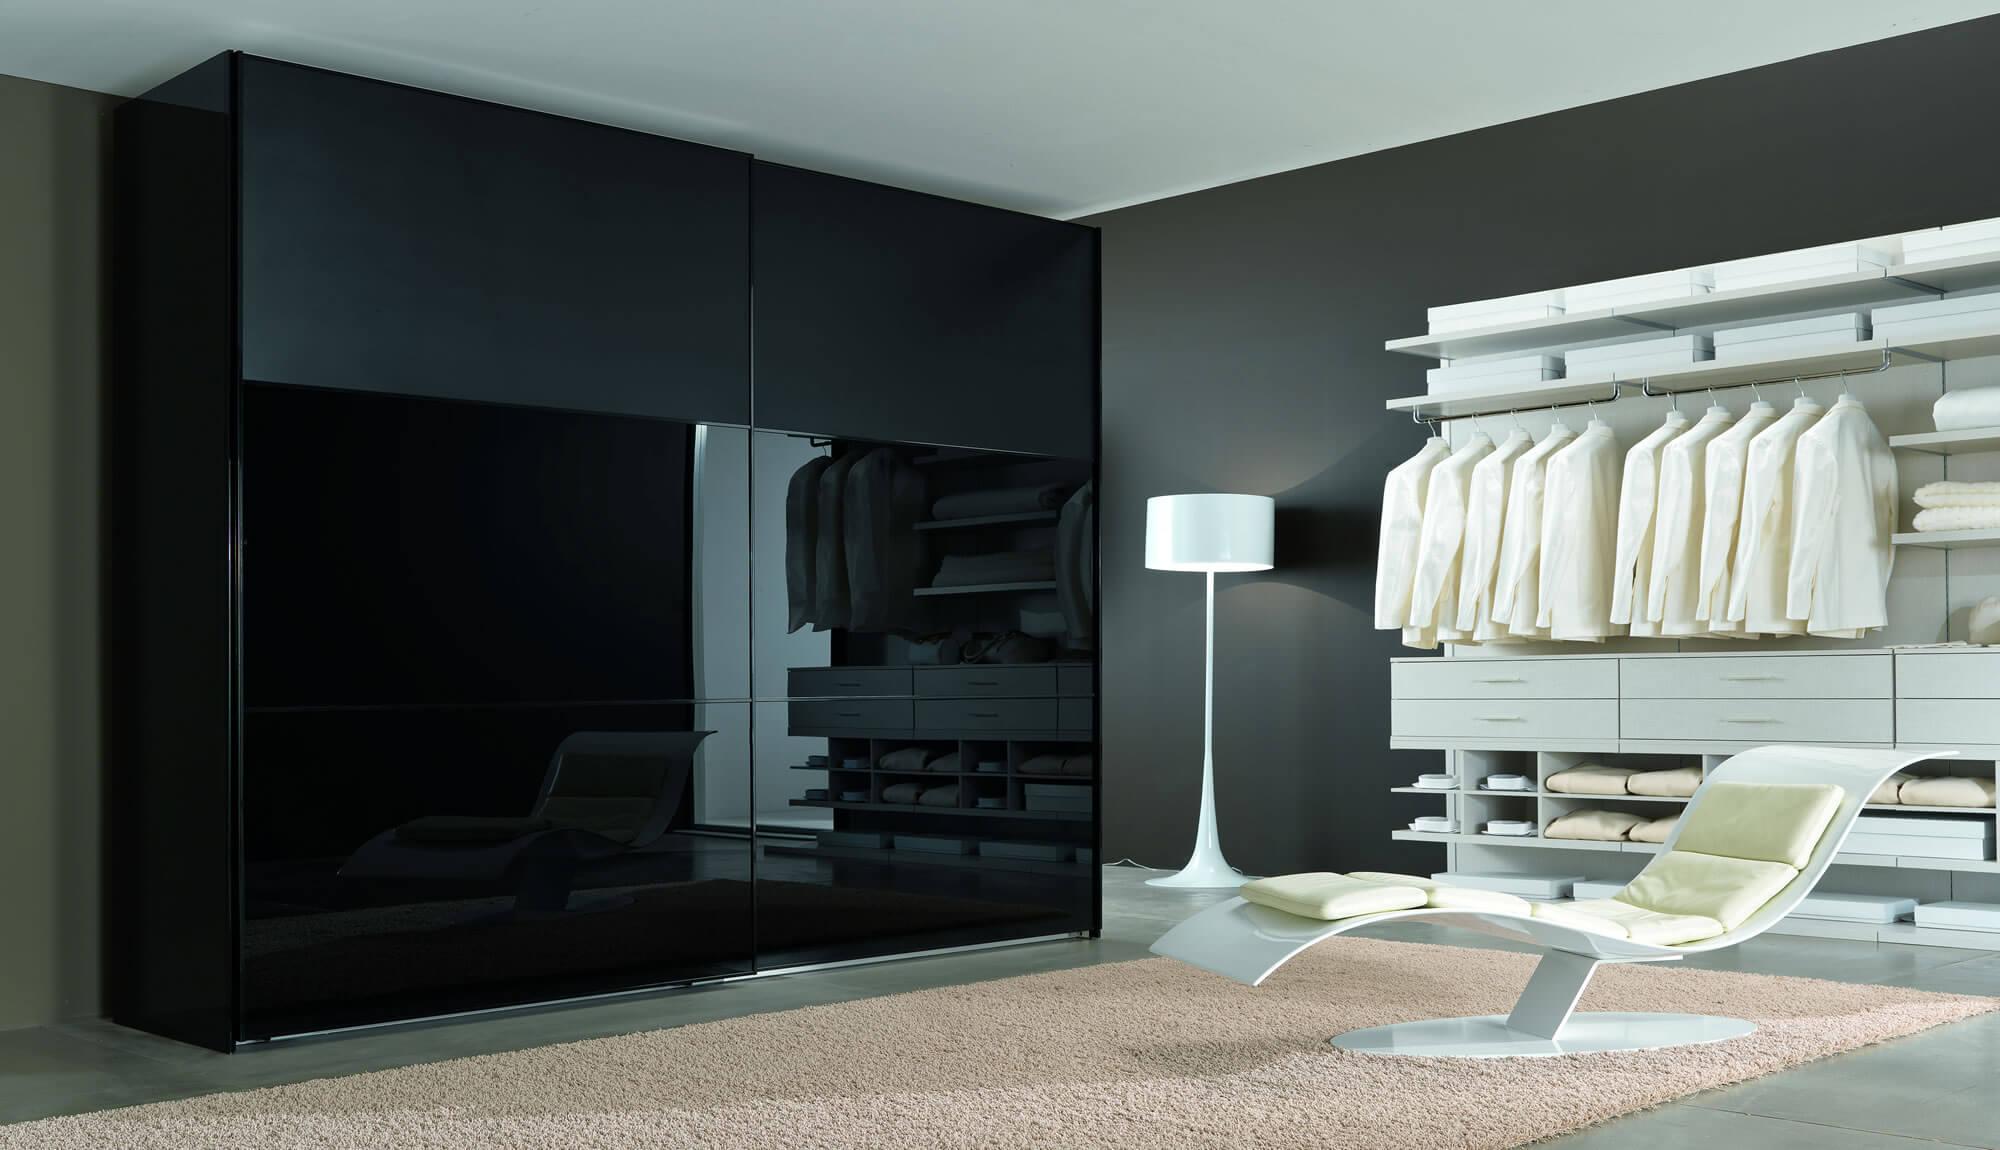 Dressing negru mobilier dressing la comanda bucuresti - Modele de dressing ...